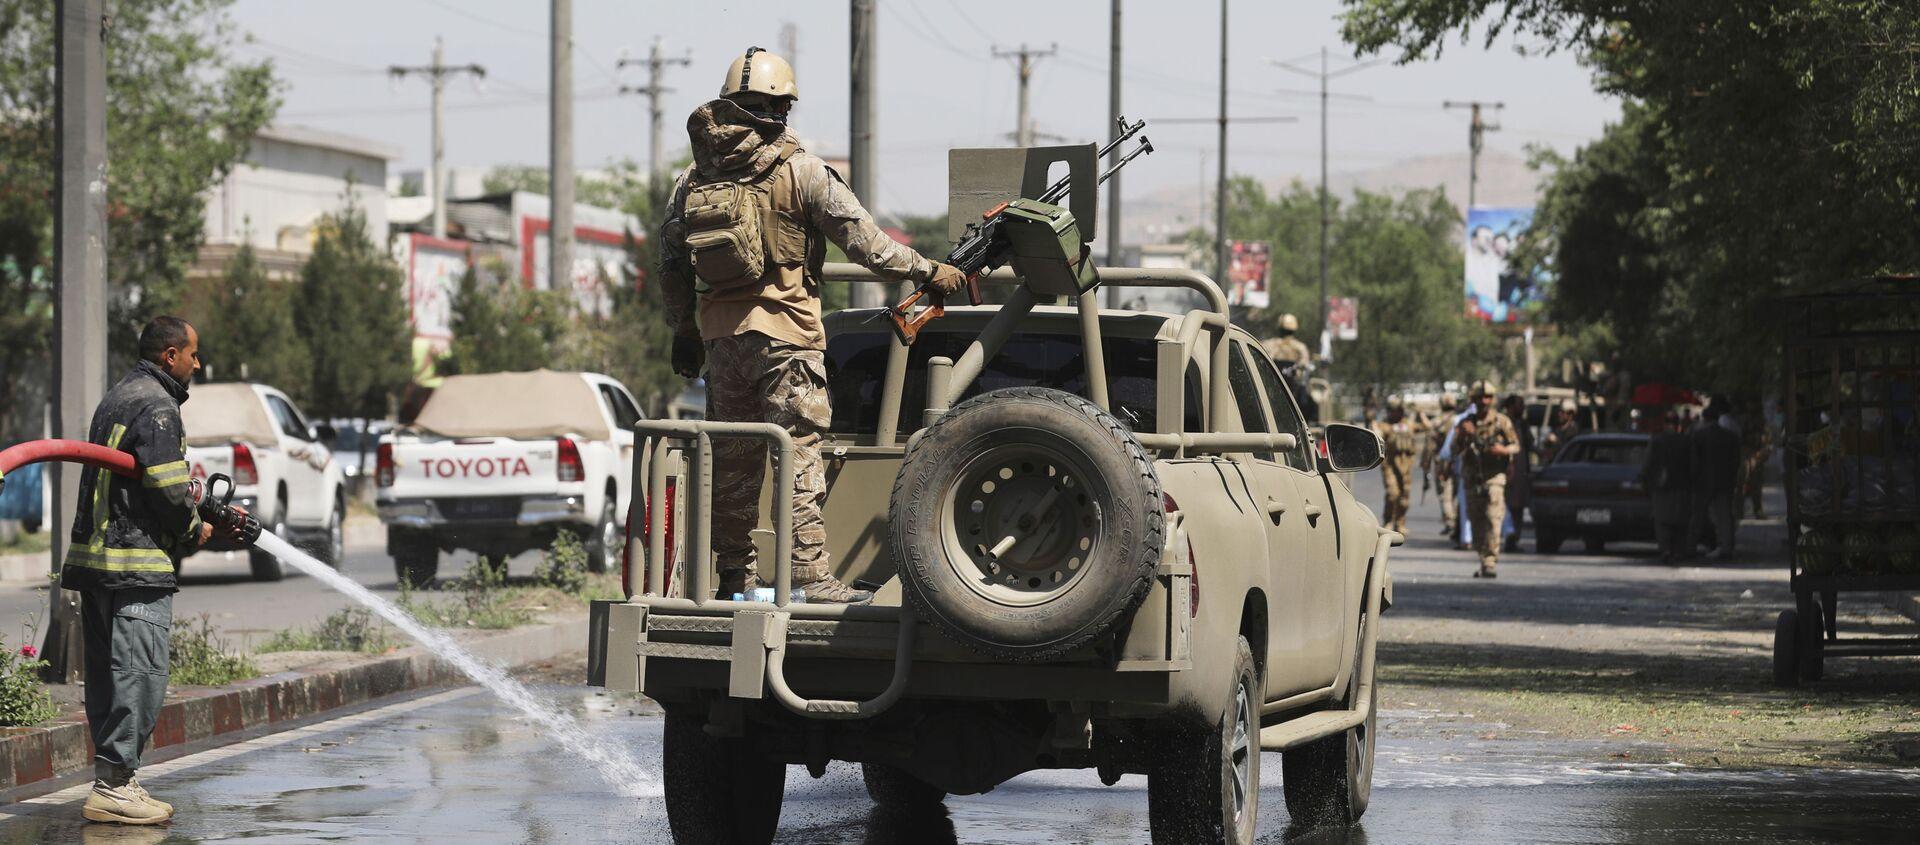 Afghan security personnel leave the scene of a roadside bomb explosion in Kabul, Afghanistan, Sunday, June 6, 2021. - Sputnik International, 1920, 04.08.2021